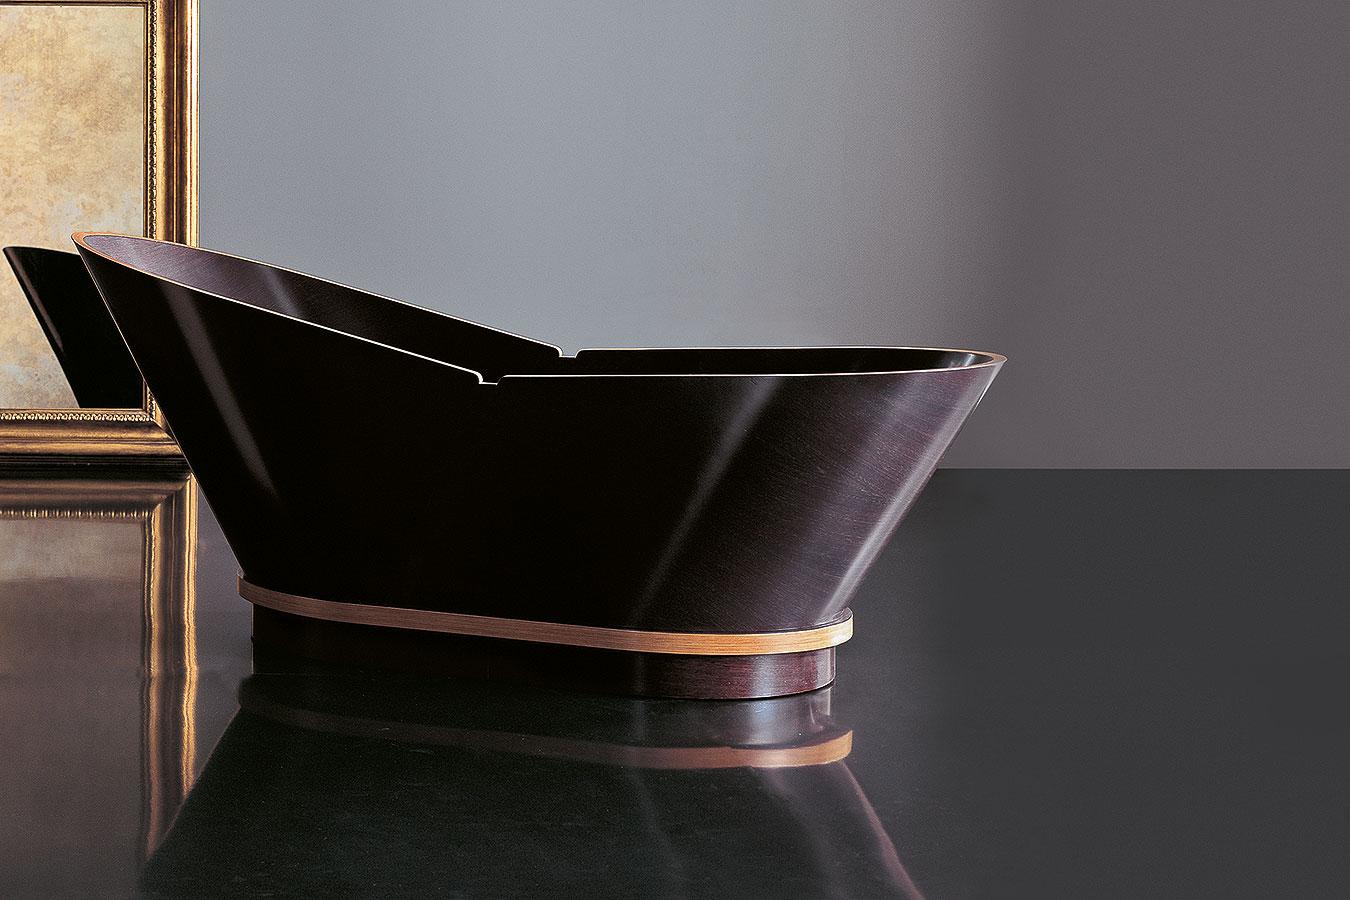 Vasche Da Bagno Angolari Treesse : Vasca da bagno con imp to termale treesse bis mts casaomnia